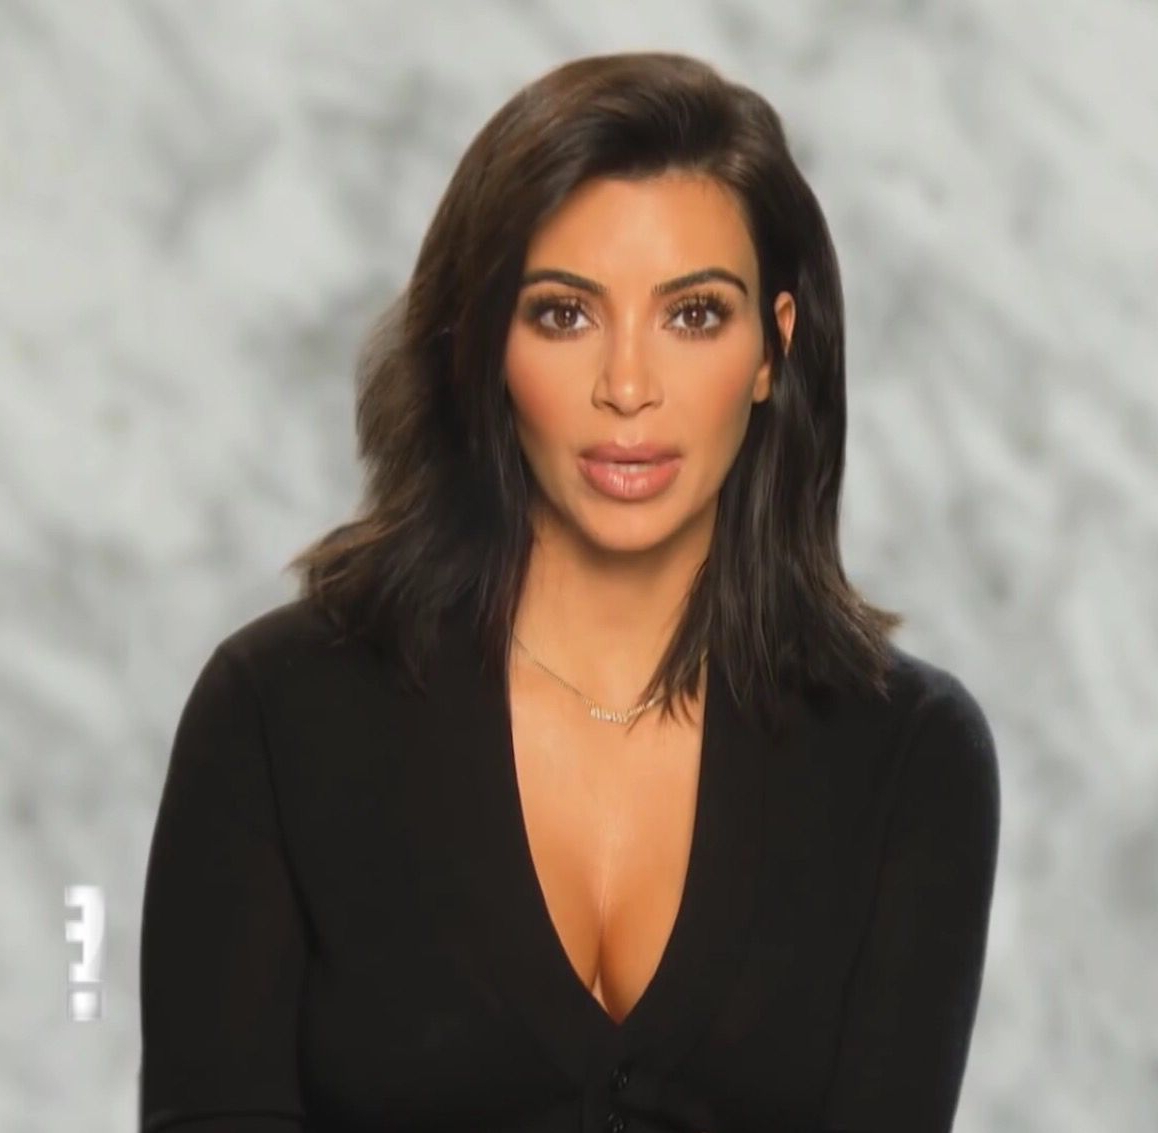 Kim Kardashian Short Hair Makeup | Hair! : ) In 2018 | Pinterest Within Kim Kardashian Short Haircuts (View 15 of 25)